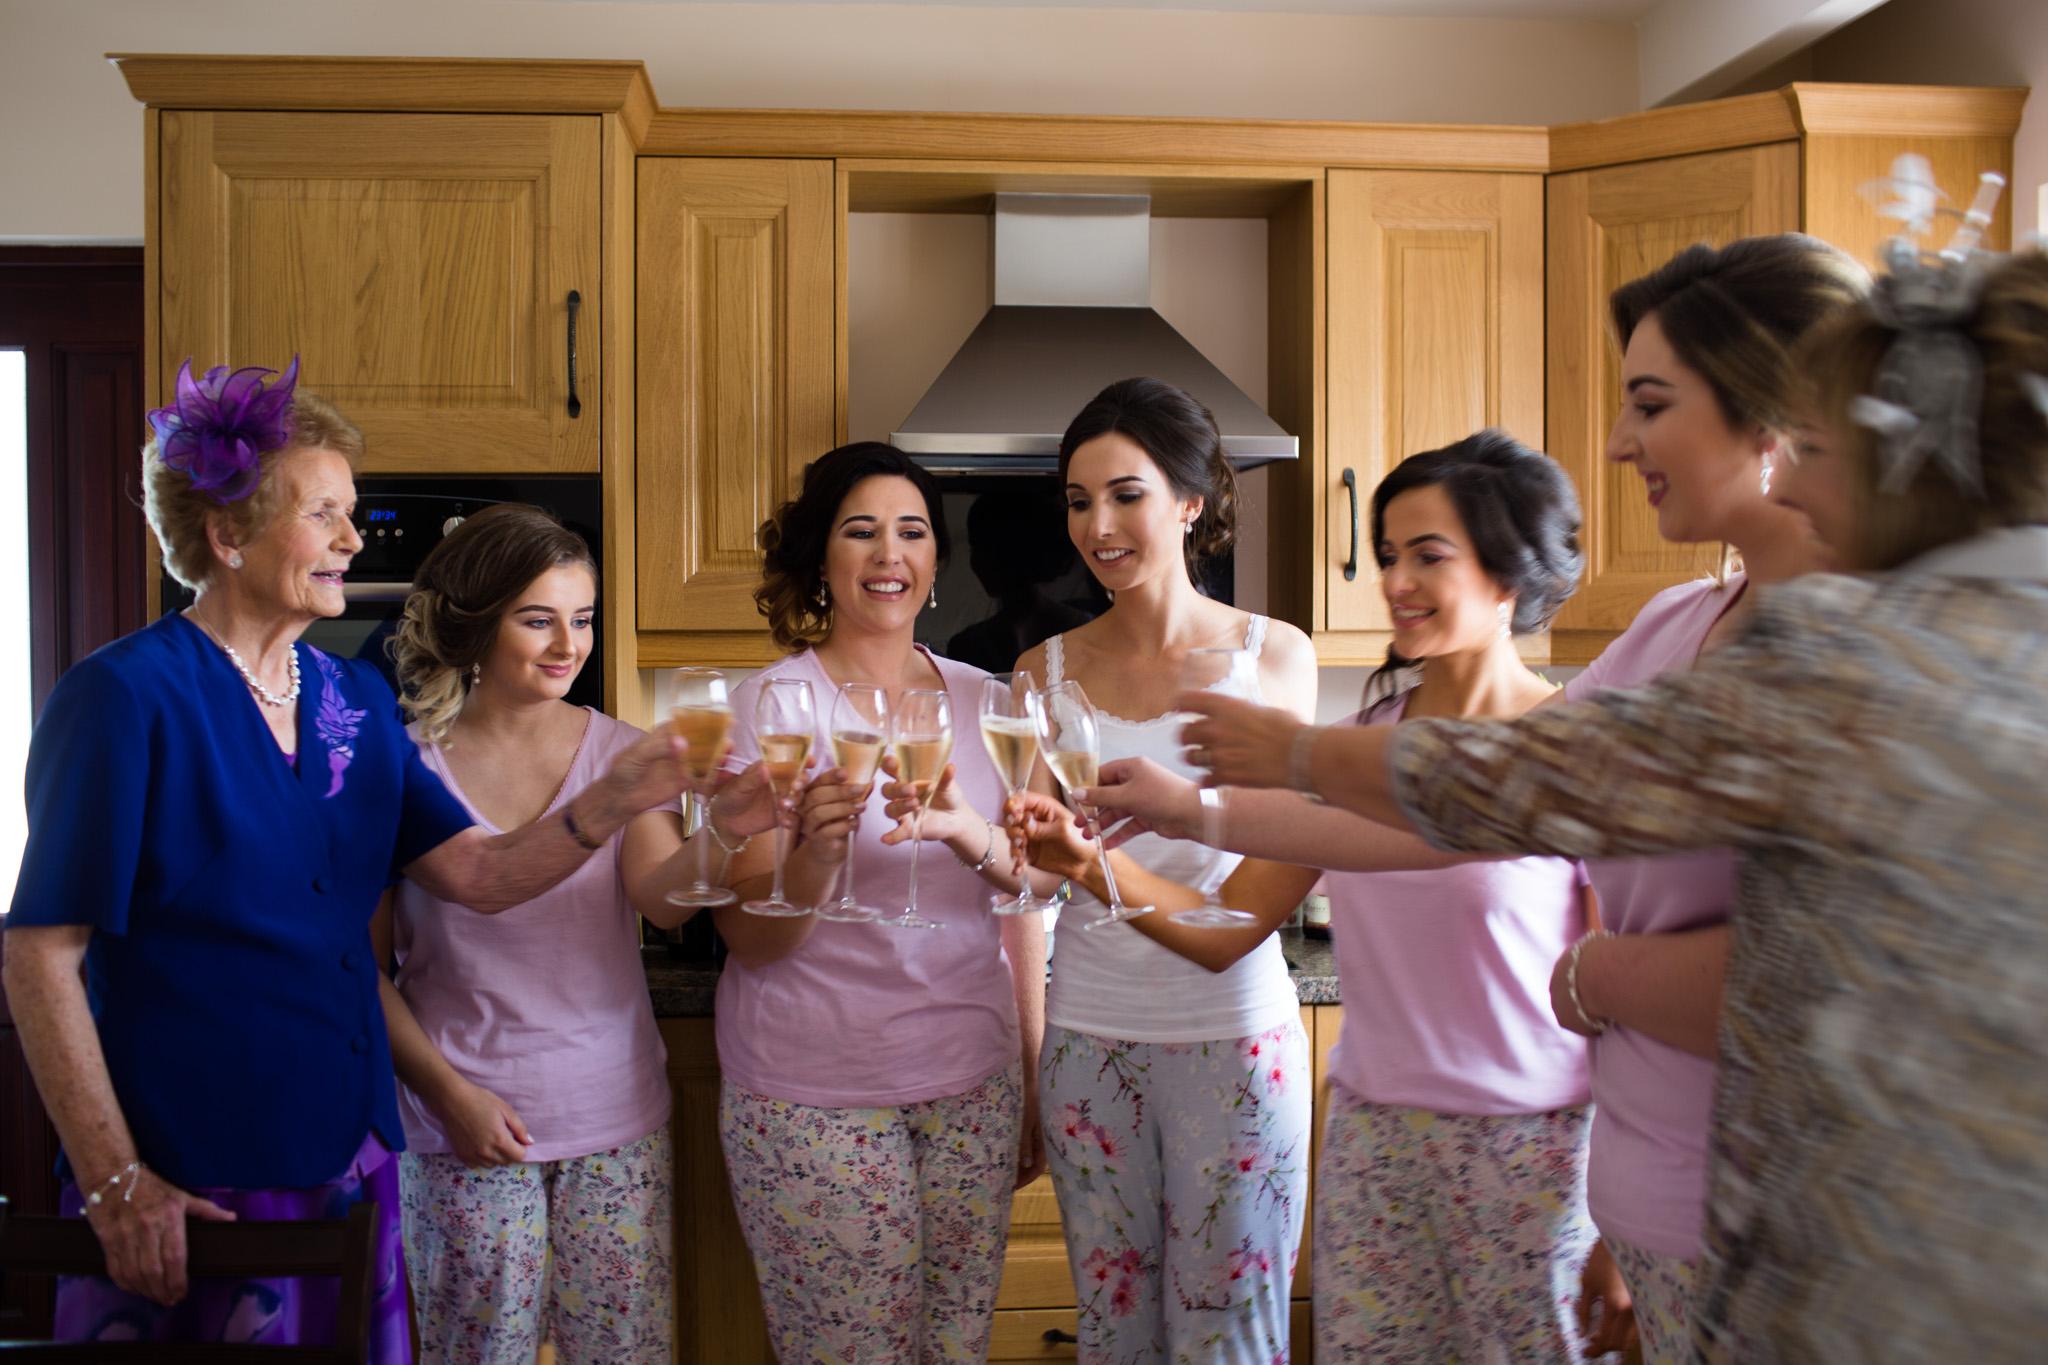 Mark_Barnes_Northern_Ireland_Wedding_Photography_Leighinmohr-house-hotel-ballymena_Wedding_Photography-7.jpg